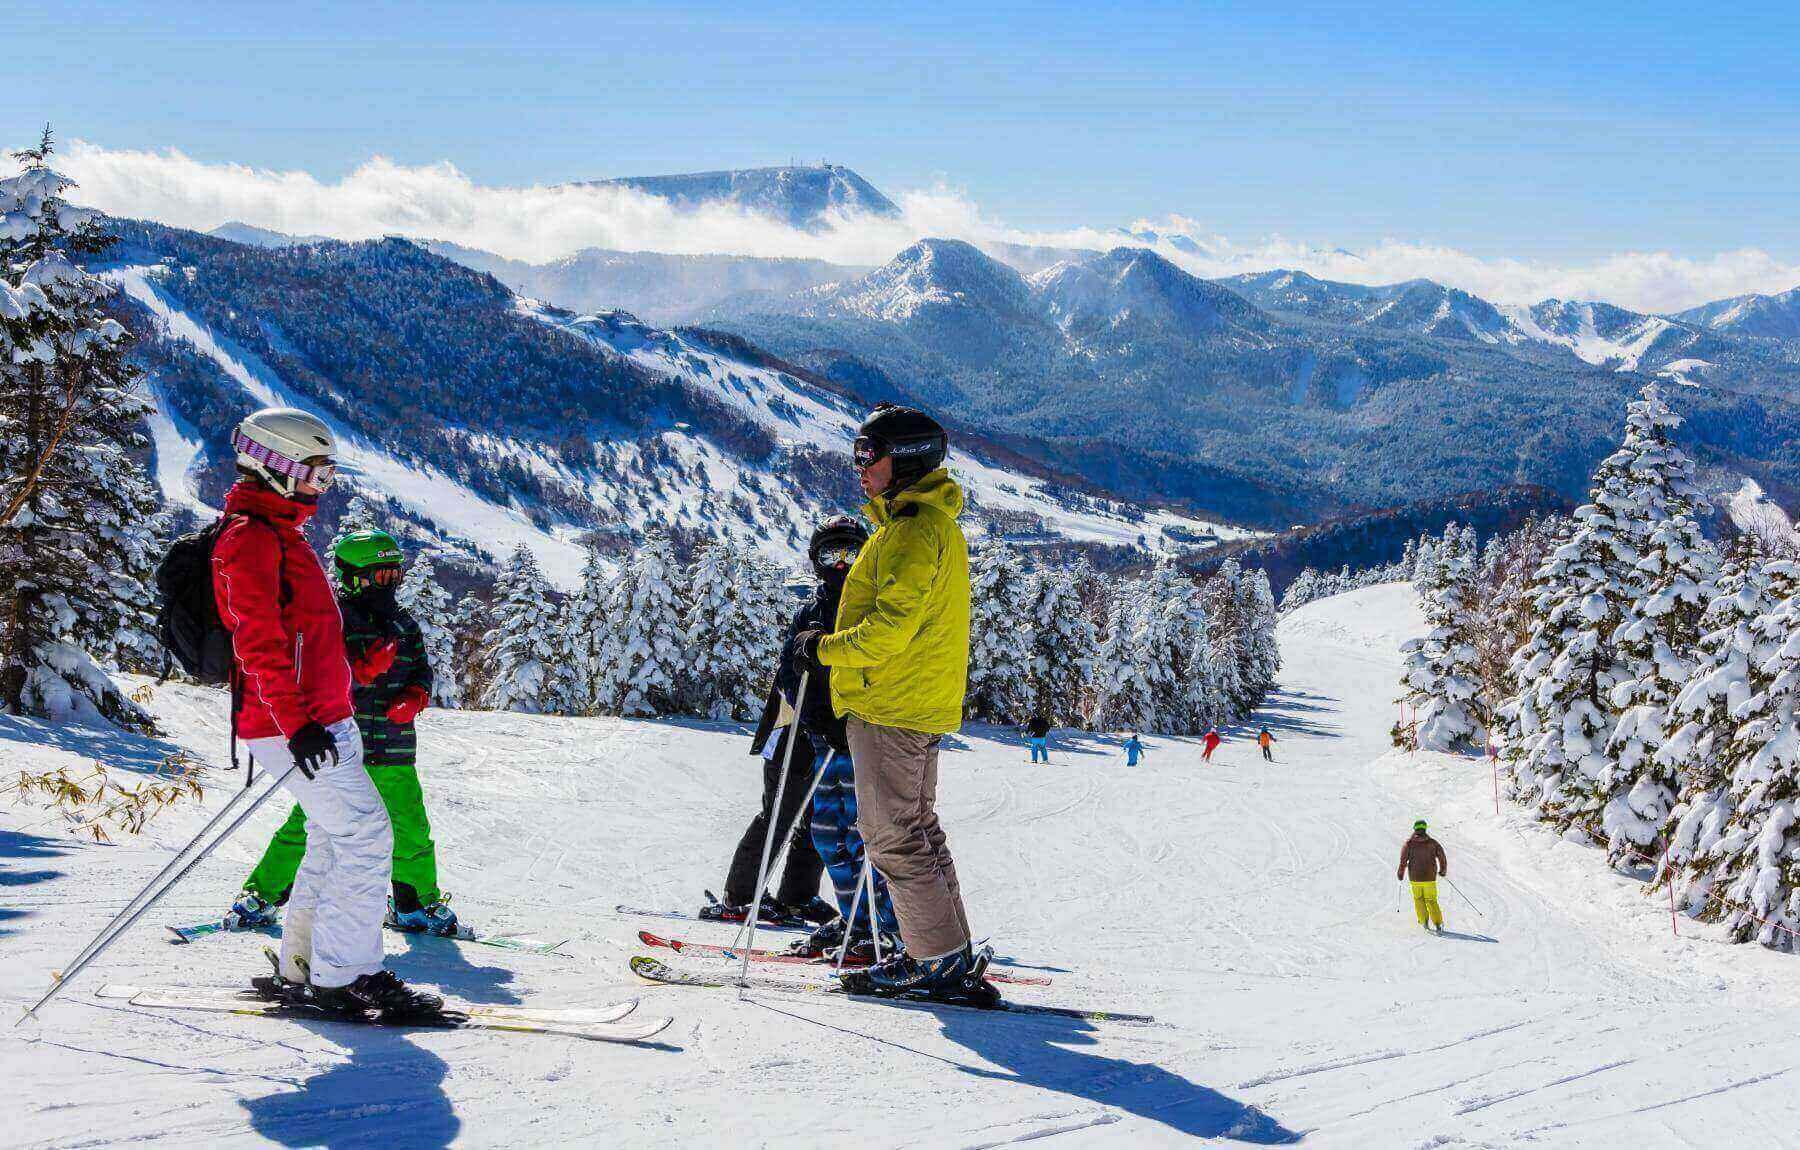 Ski resort Shiga Kogen_shutterstock_Tetyana Dotsenkos-min